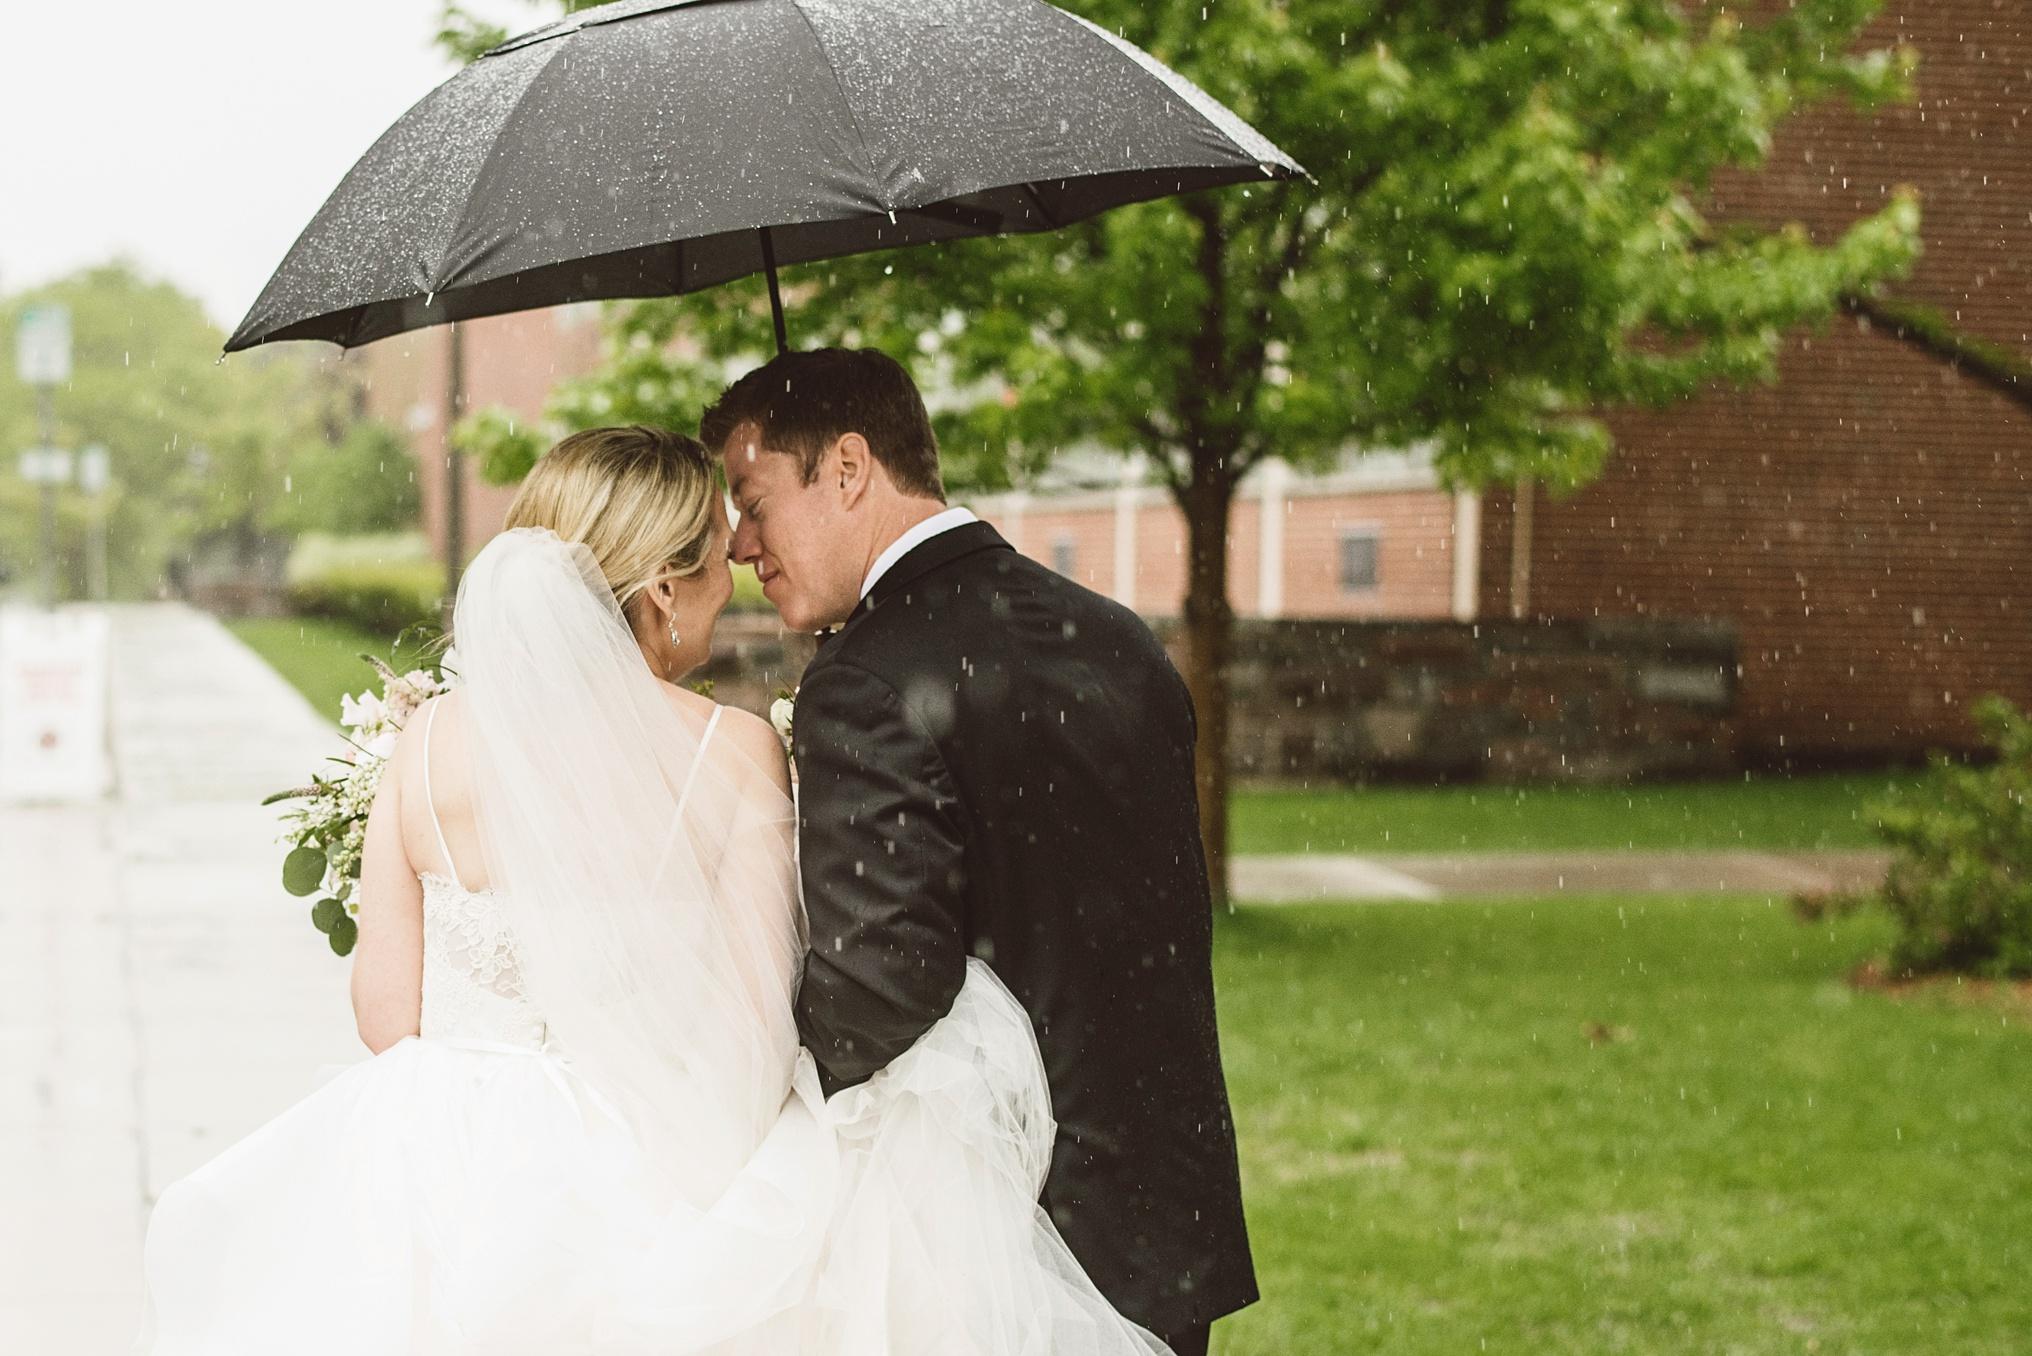 best_wedding_photography_2017_by_lucas_botz_photography_069.jpg